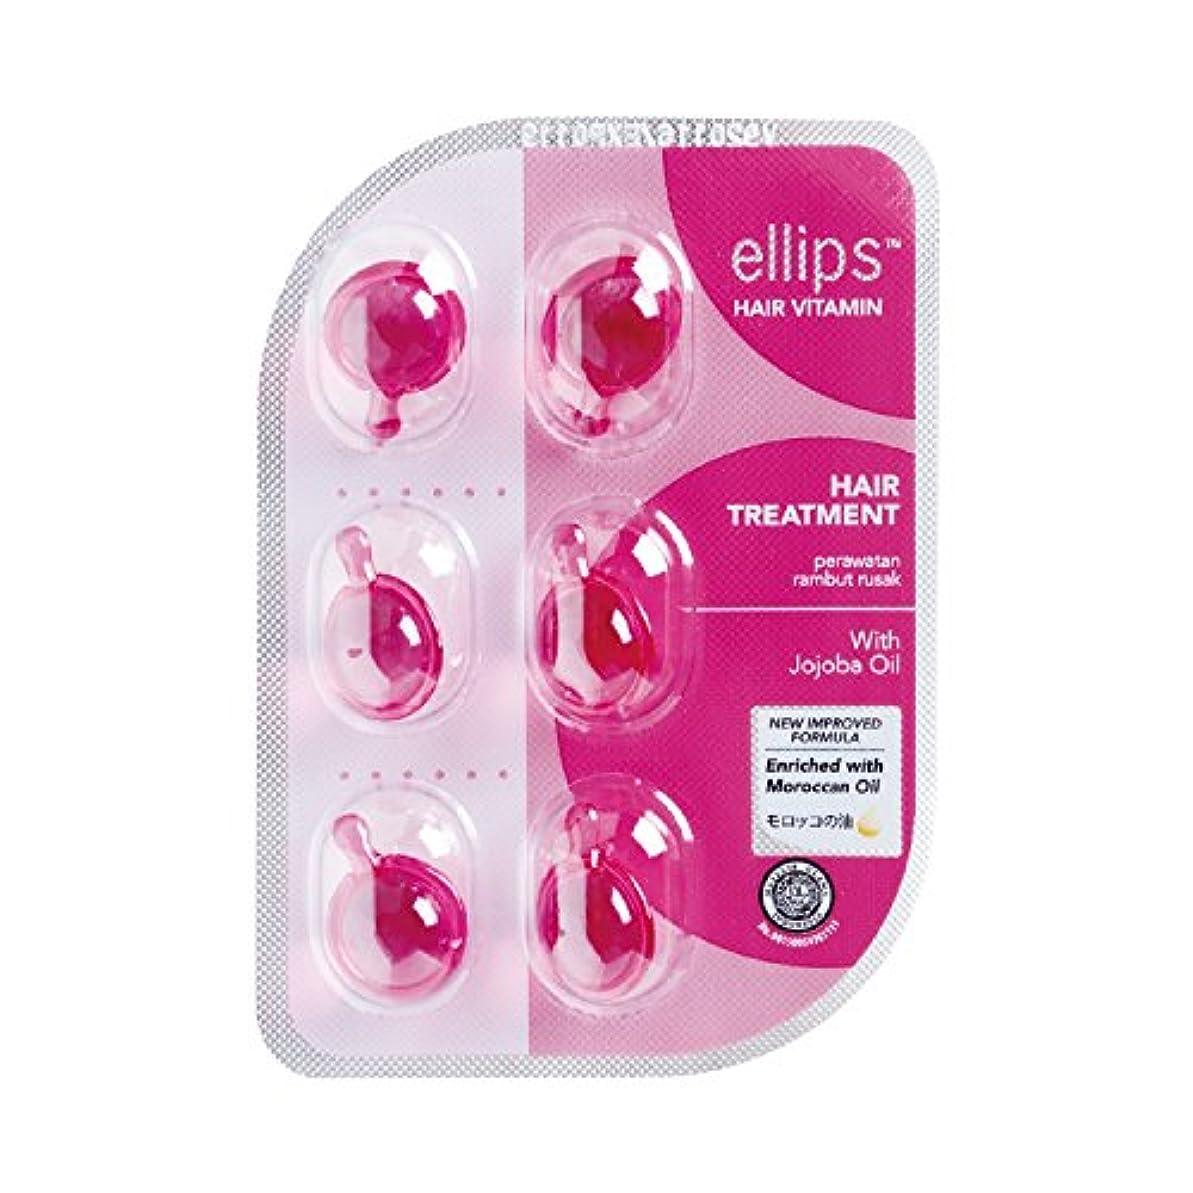 [ym] 2個セット エリップス Ellips ヘアビタミン 6粒入り シートタイプ 洗い流さない トリートメント (2シート(12粒), ピンク)